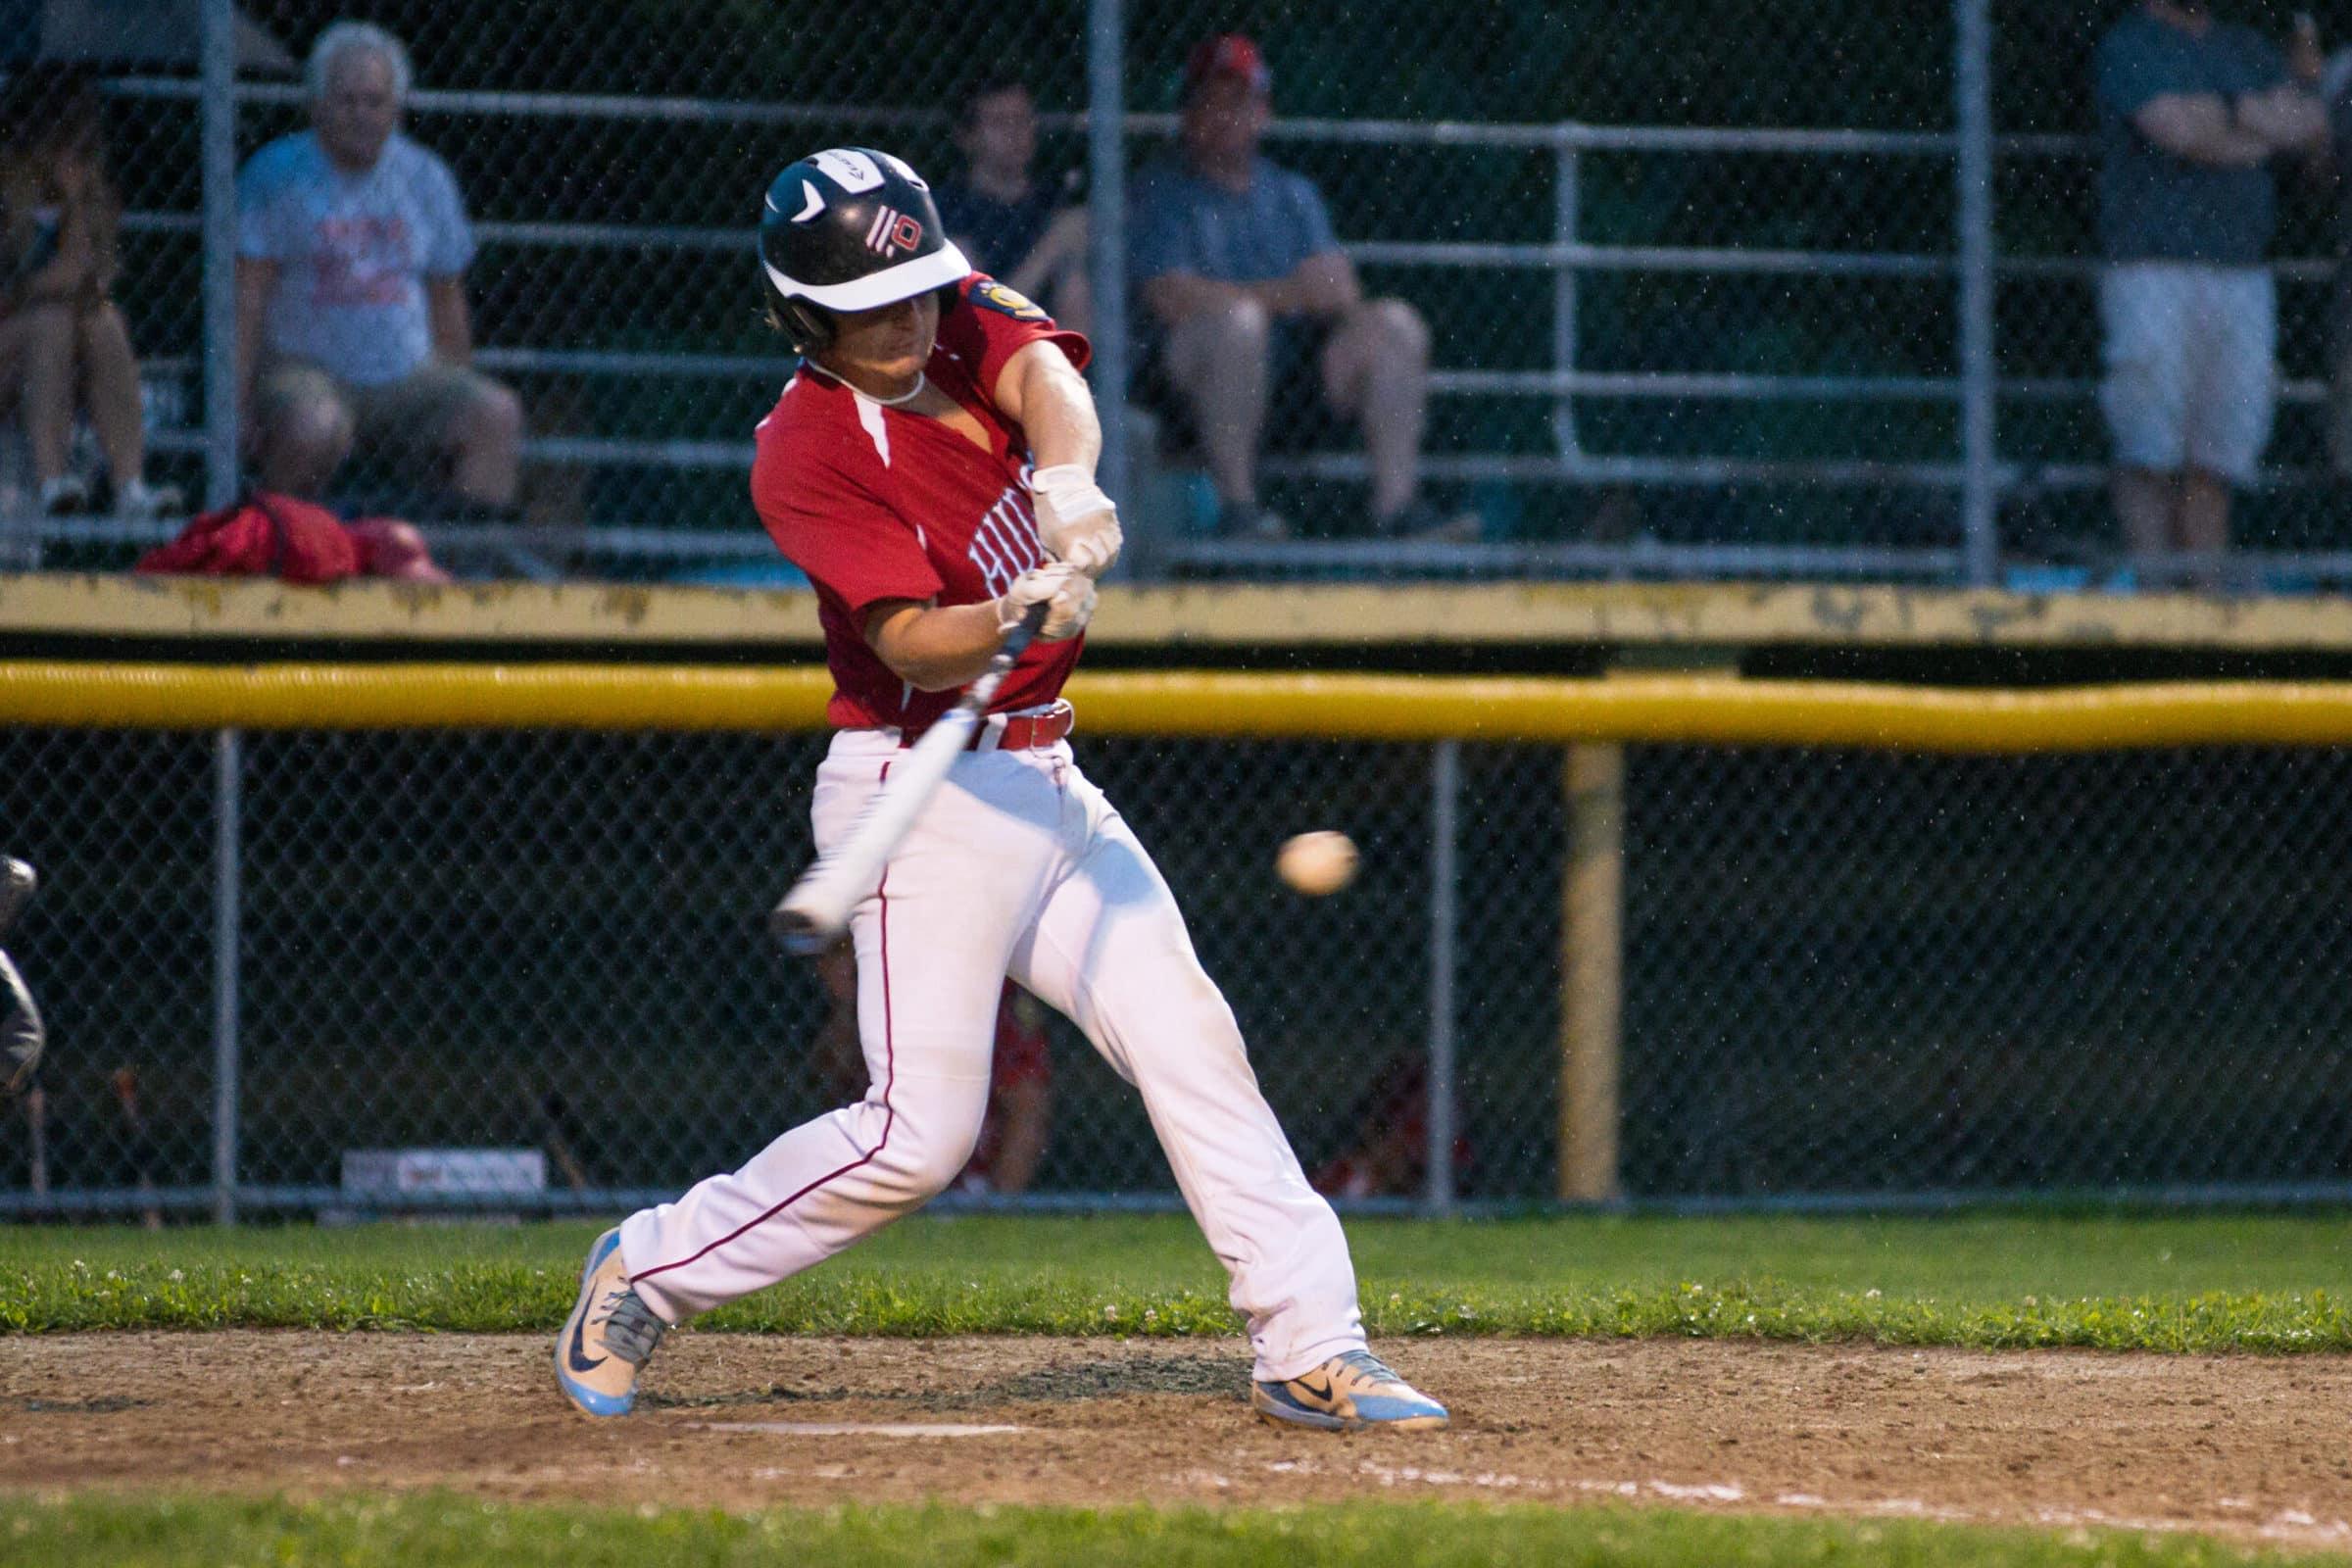 A Hudson Legion Post 100 batter swings on a pitch July 14.